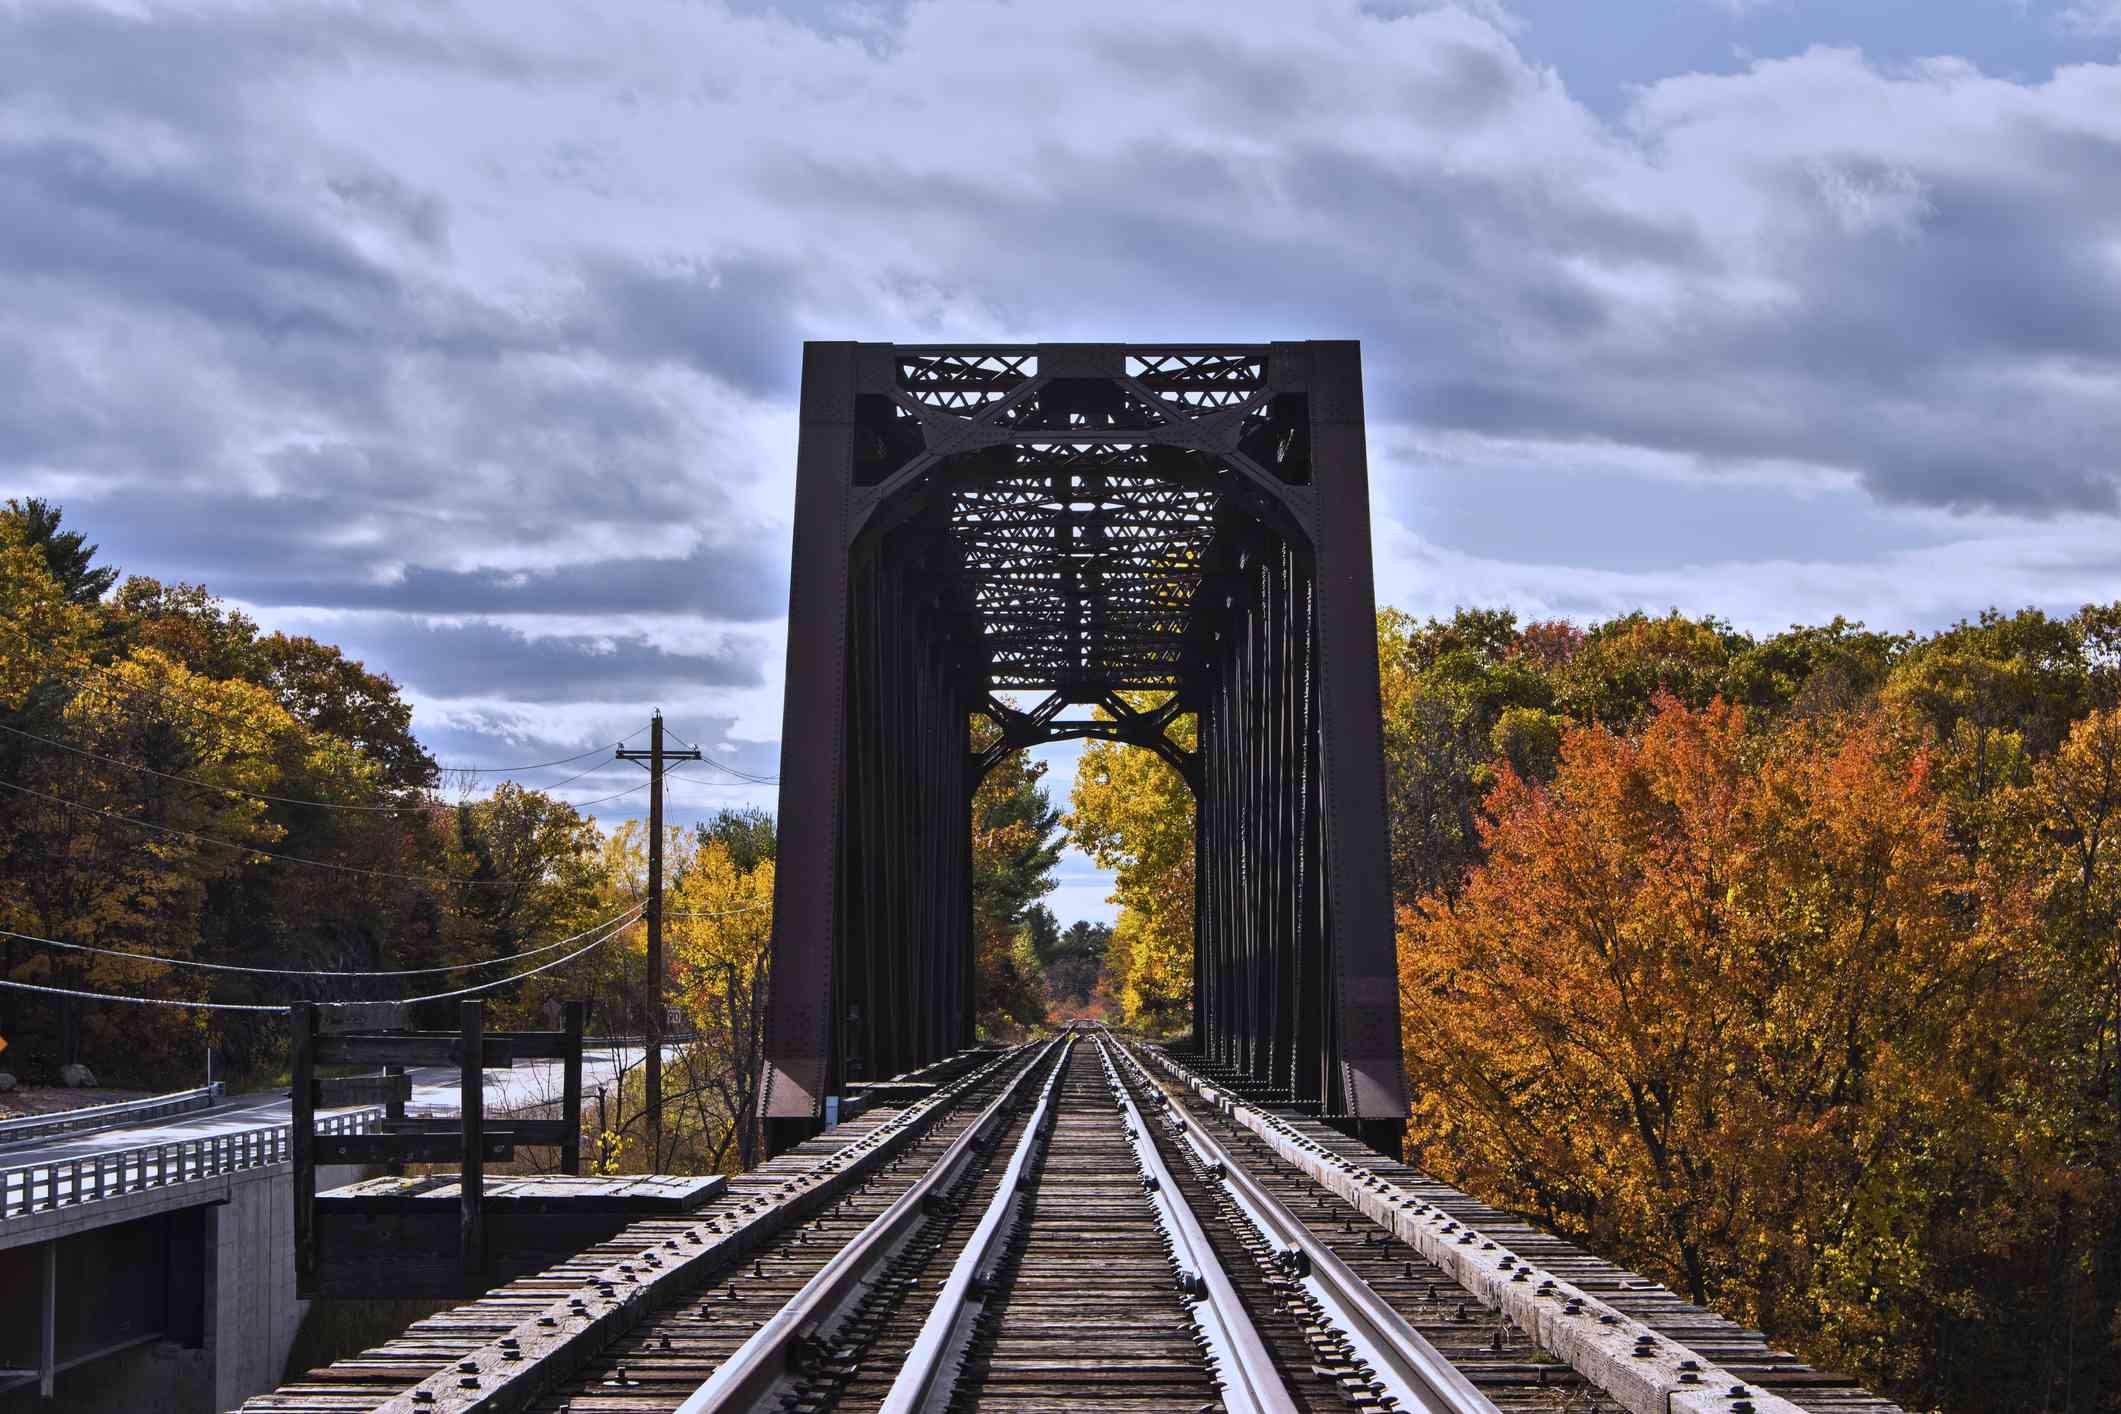 Train tracks on bridge through fall foliage in Quebec